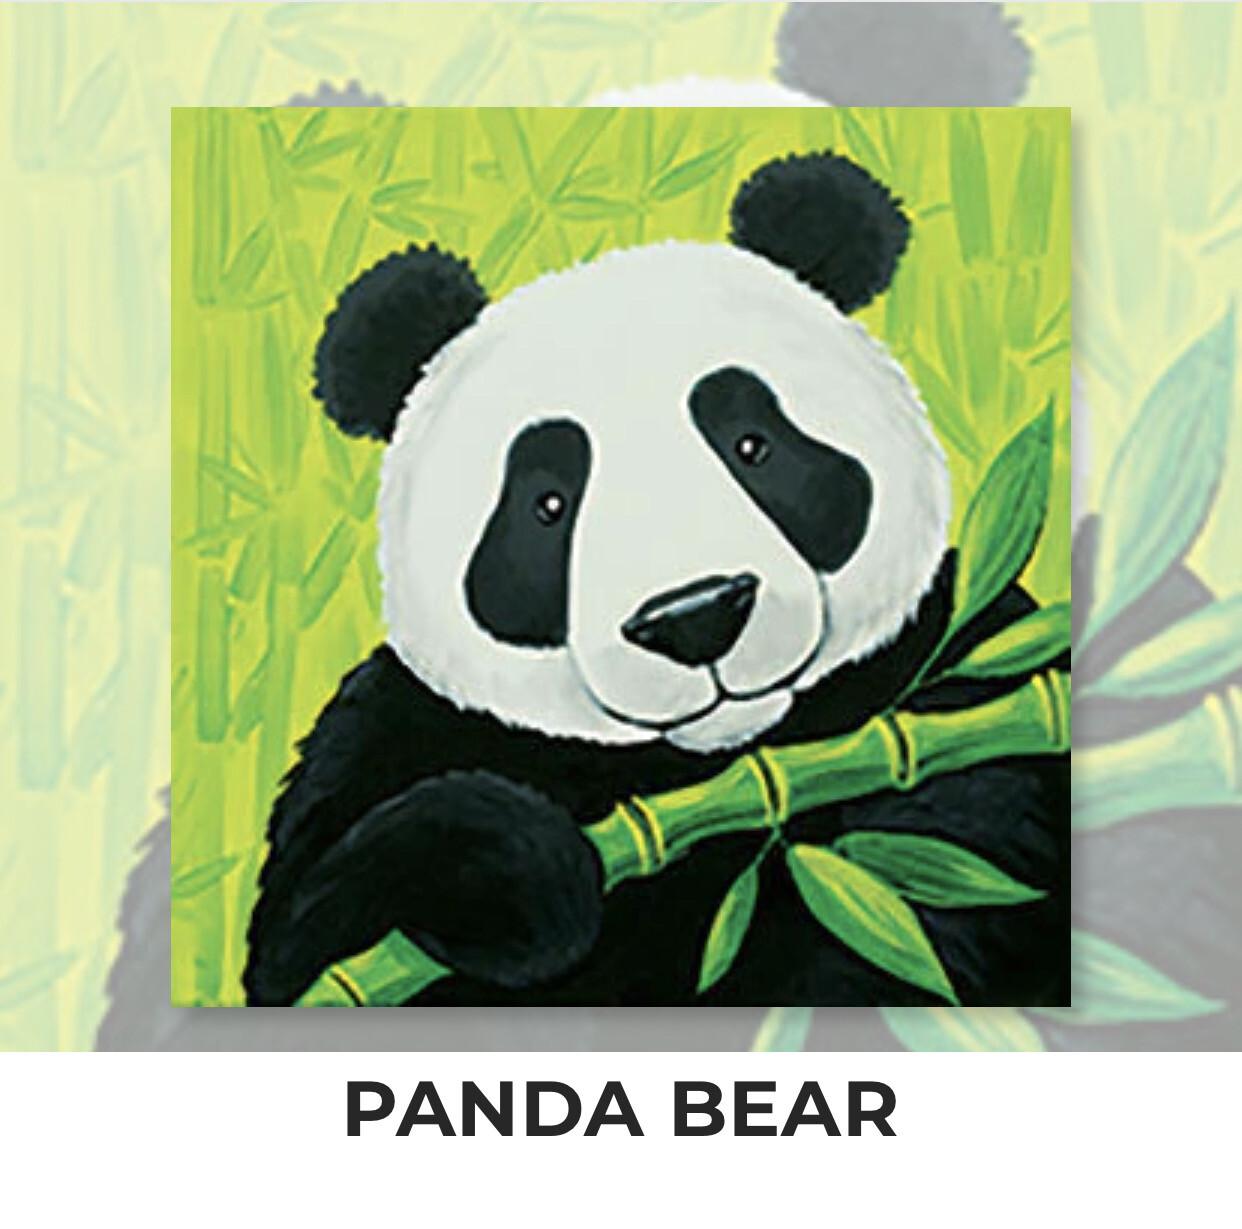 Panda Bear KIDS Acrylic Paint On Canvas DIY Art Kit